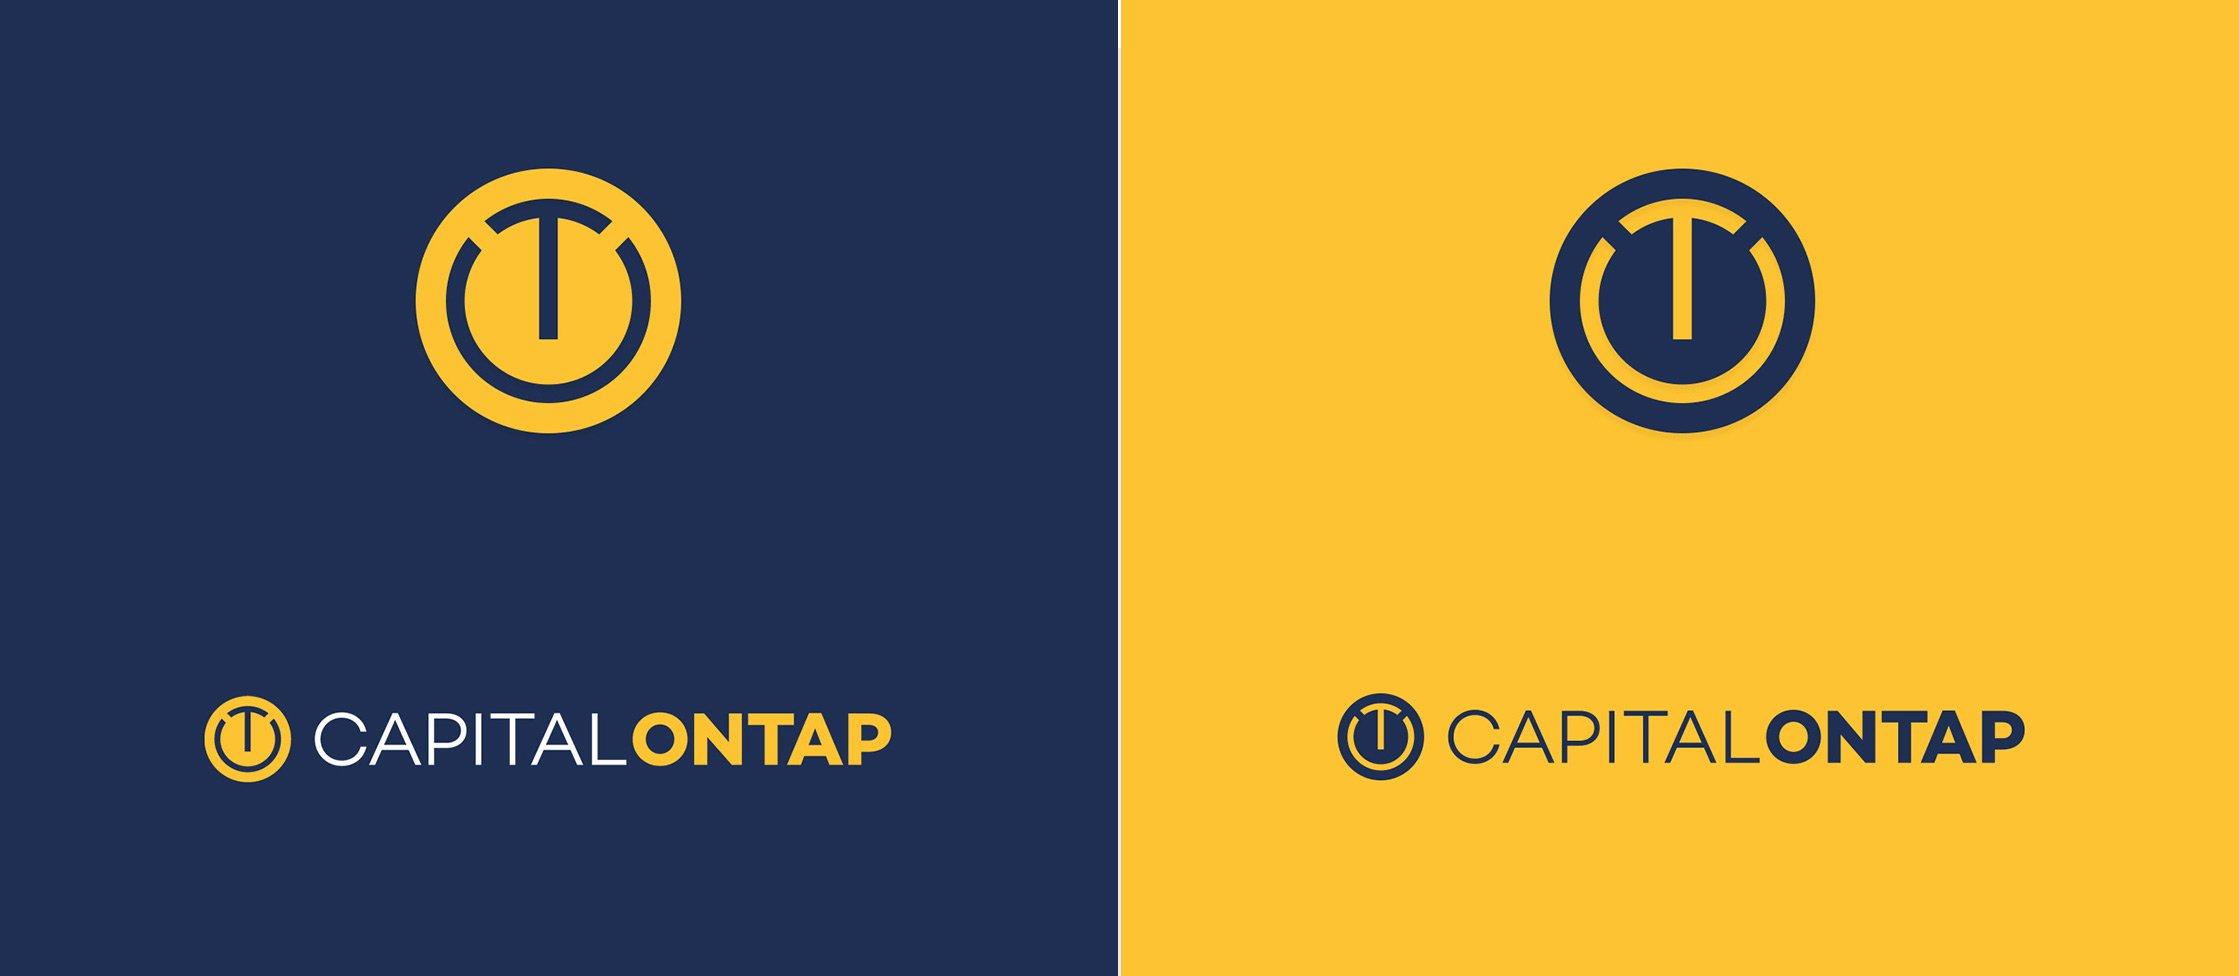 Capital OnTap logos